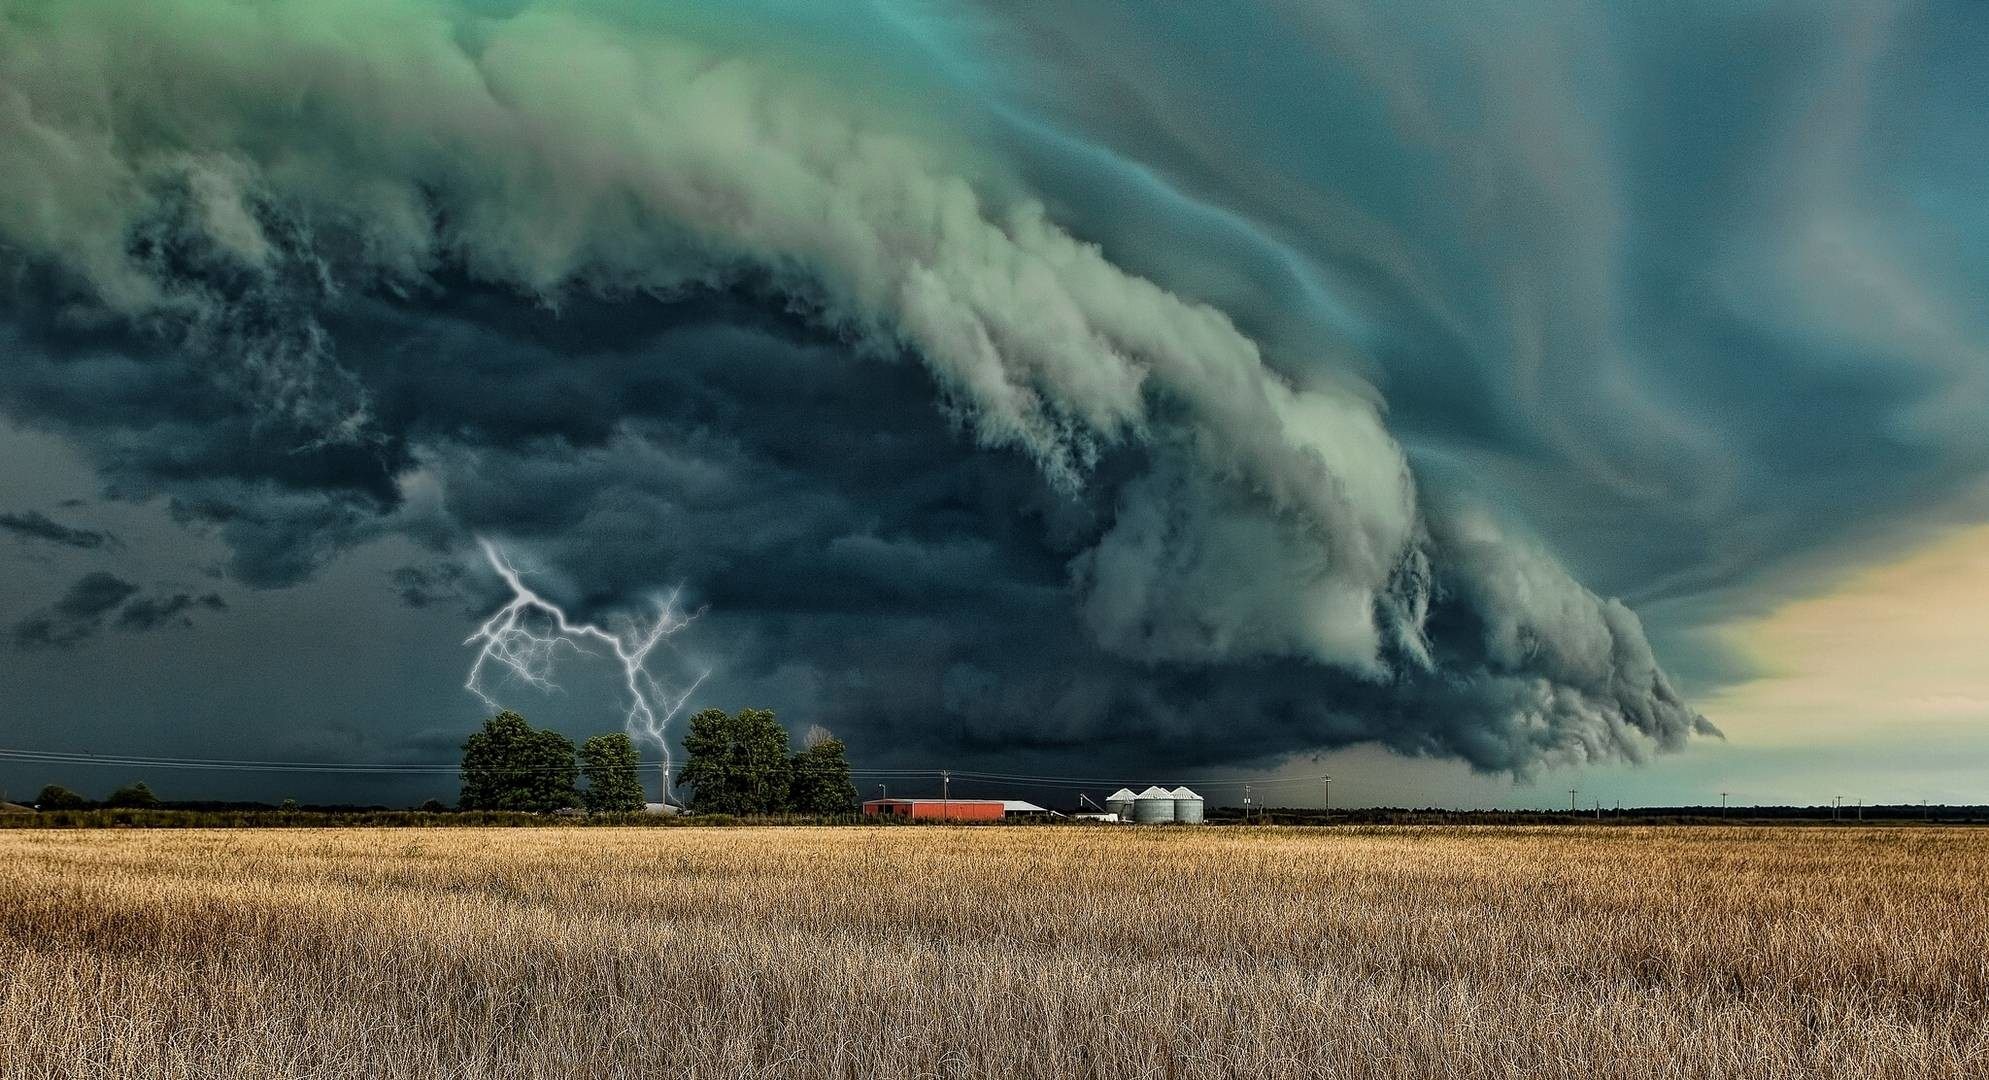 Storm Cloud Wallpaper 68 Pictures